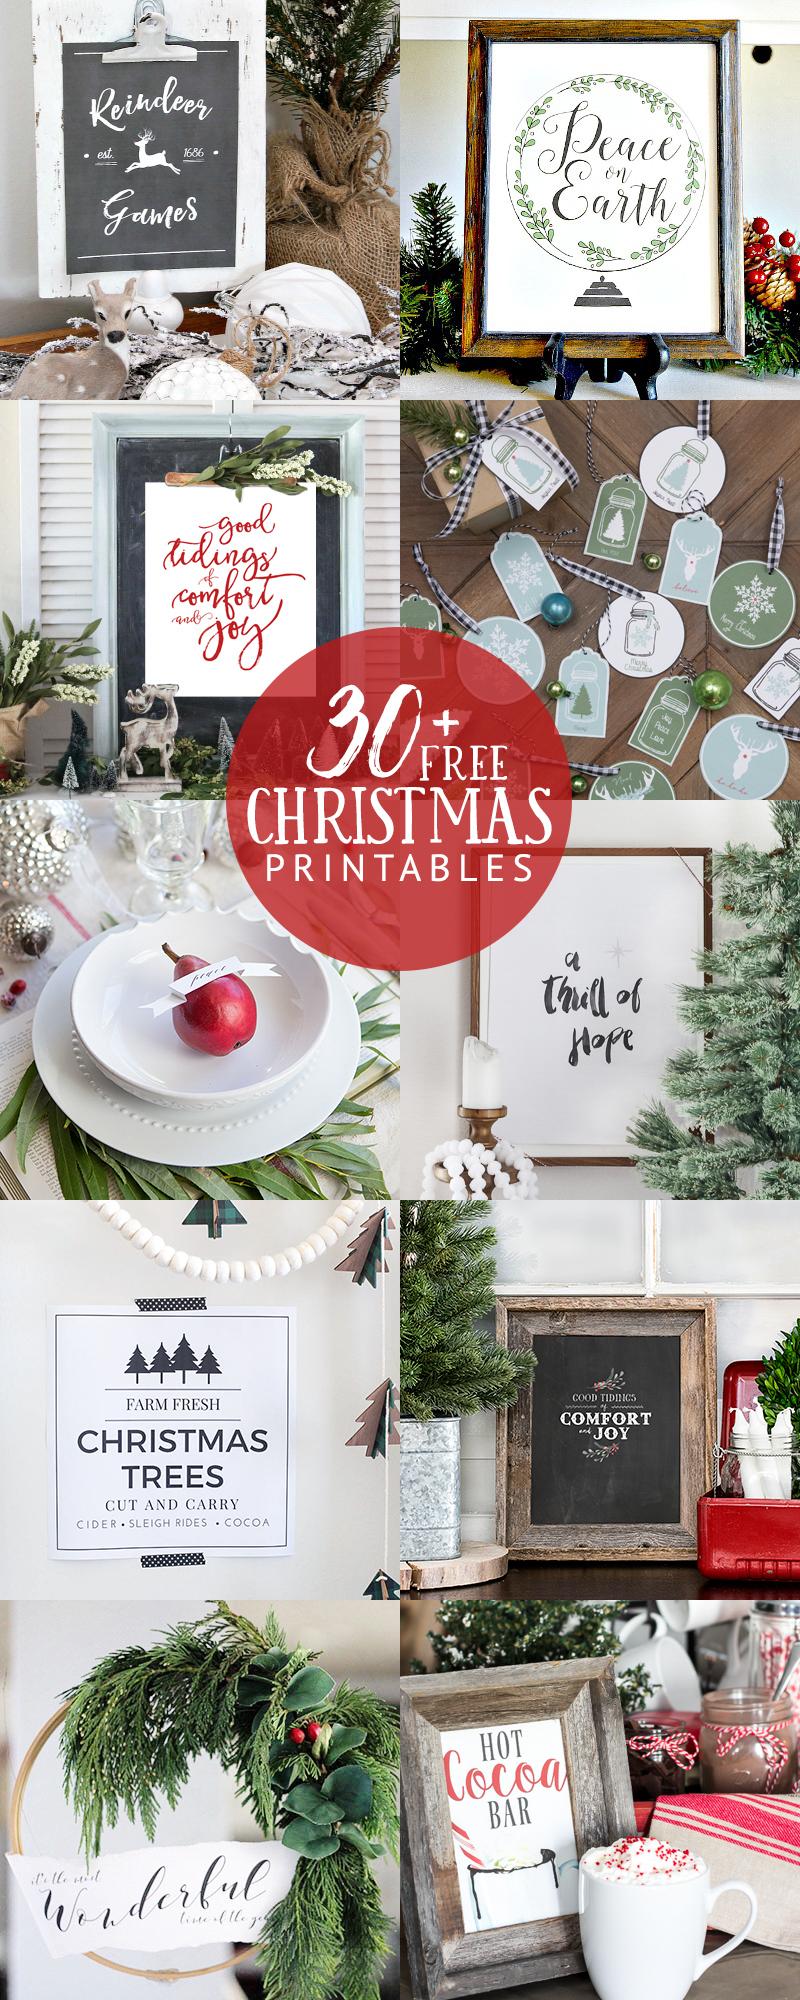 Creative Free Christmas Printables kellyelko.com